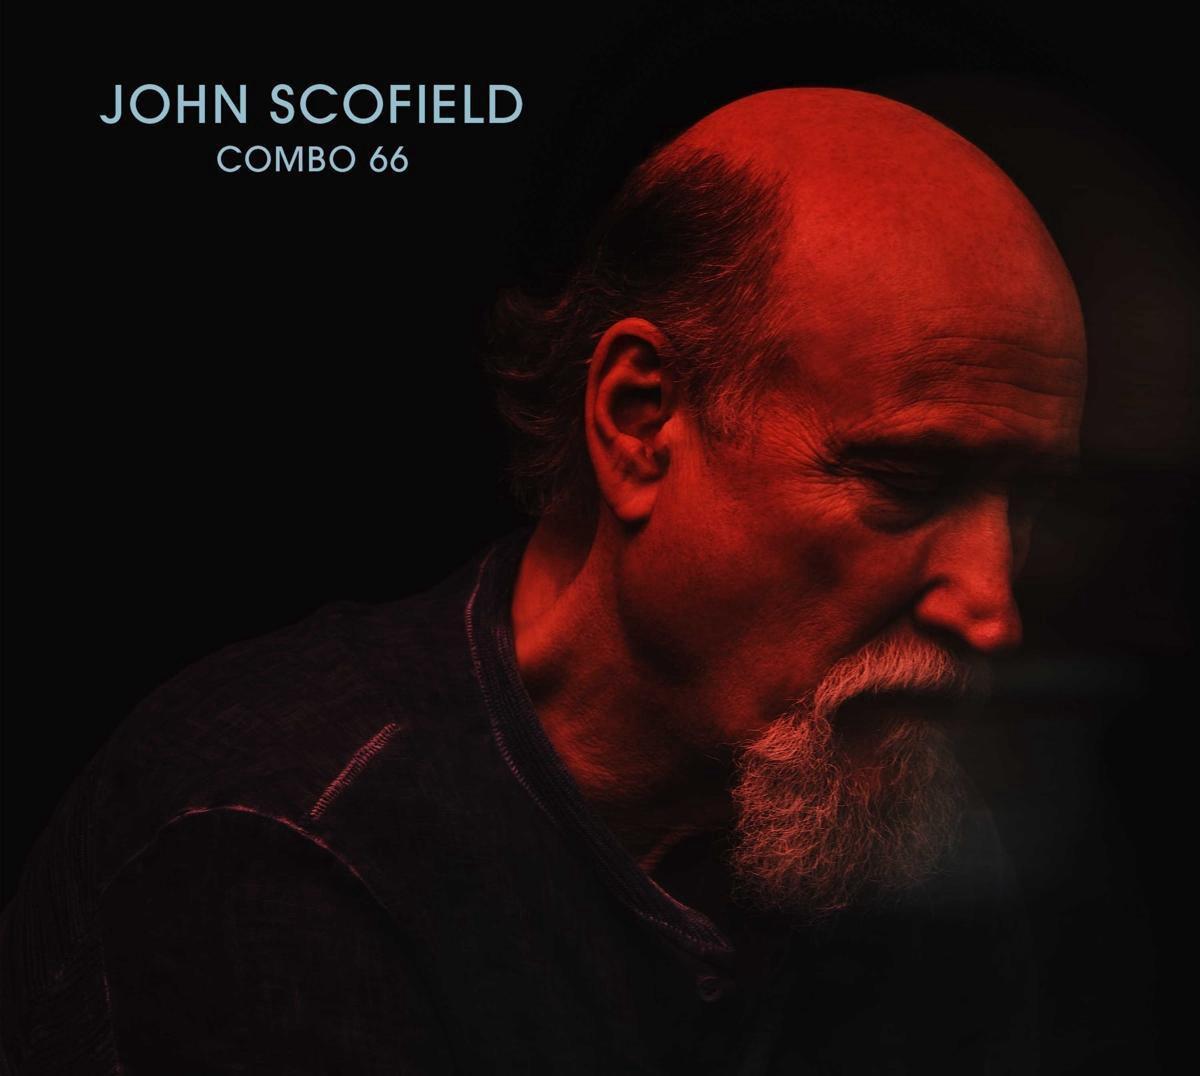 Combo 66 - John Scofield